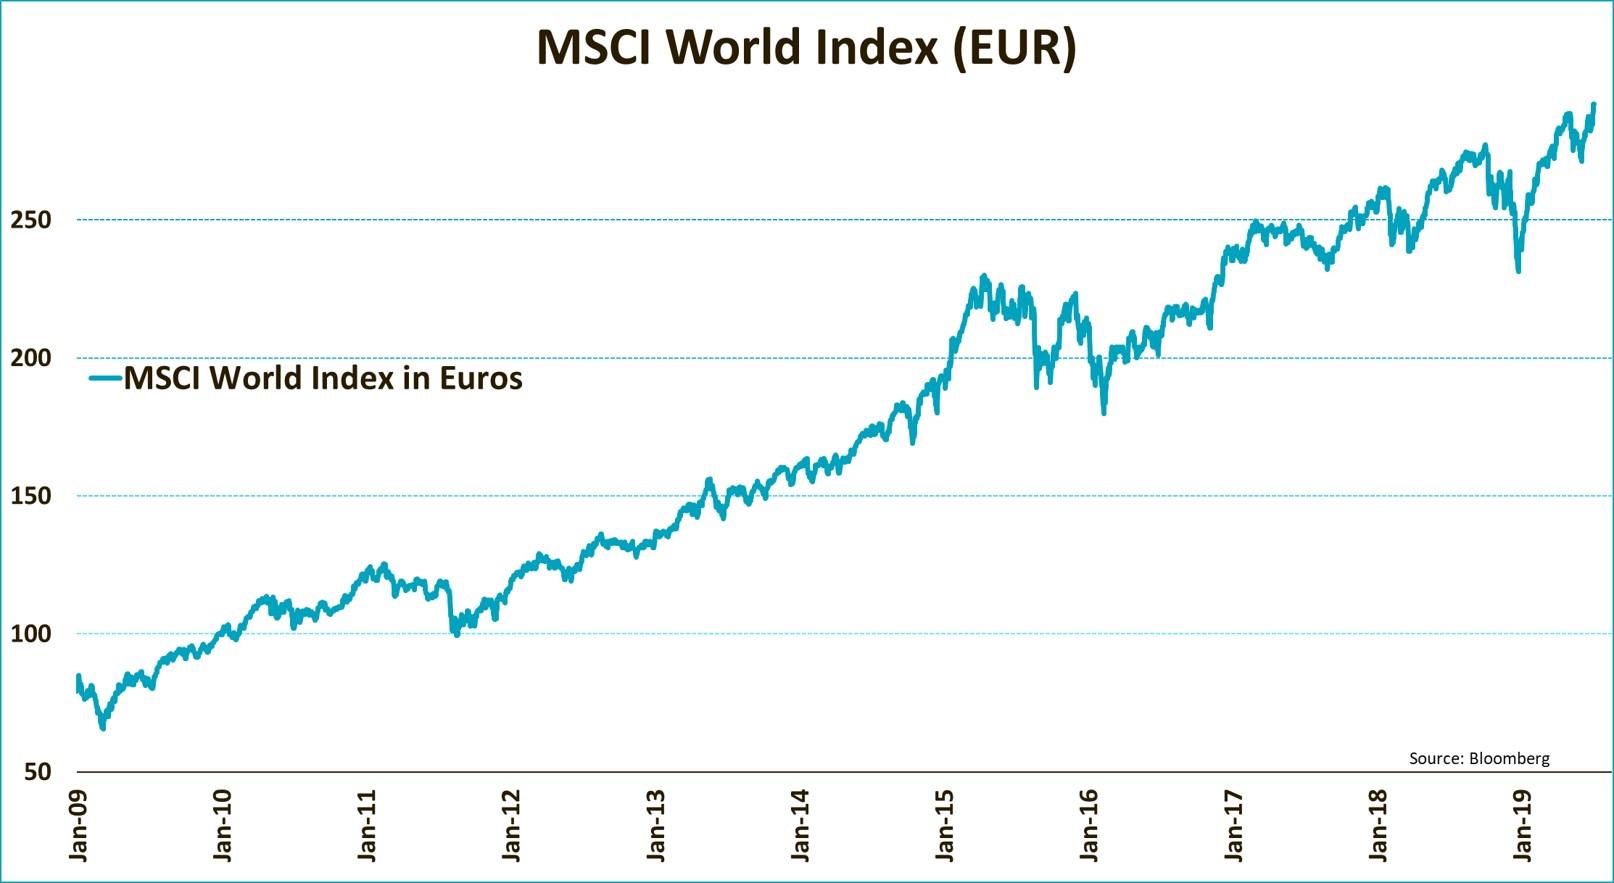 MSCI World Index (Eur)